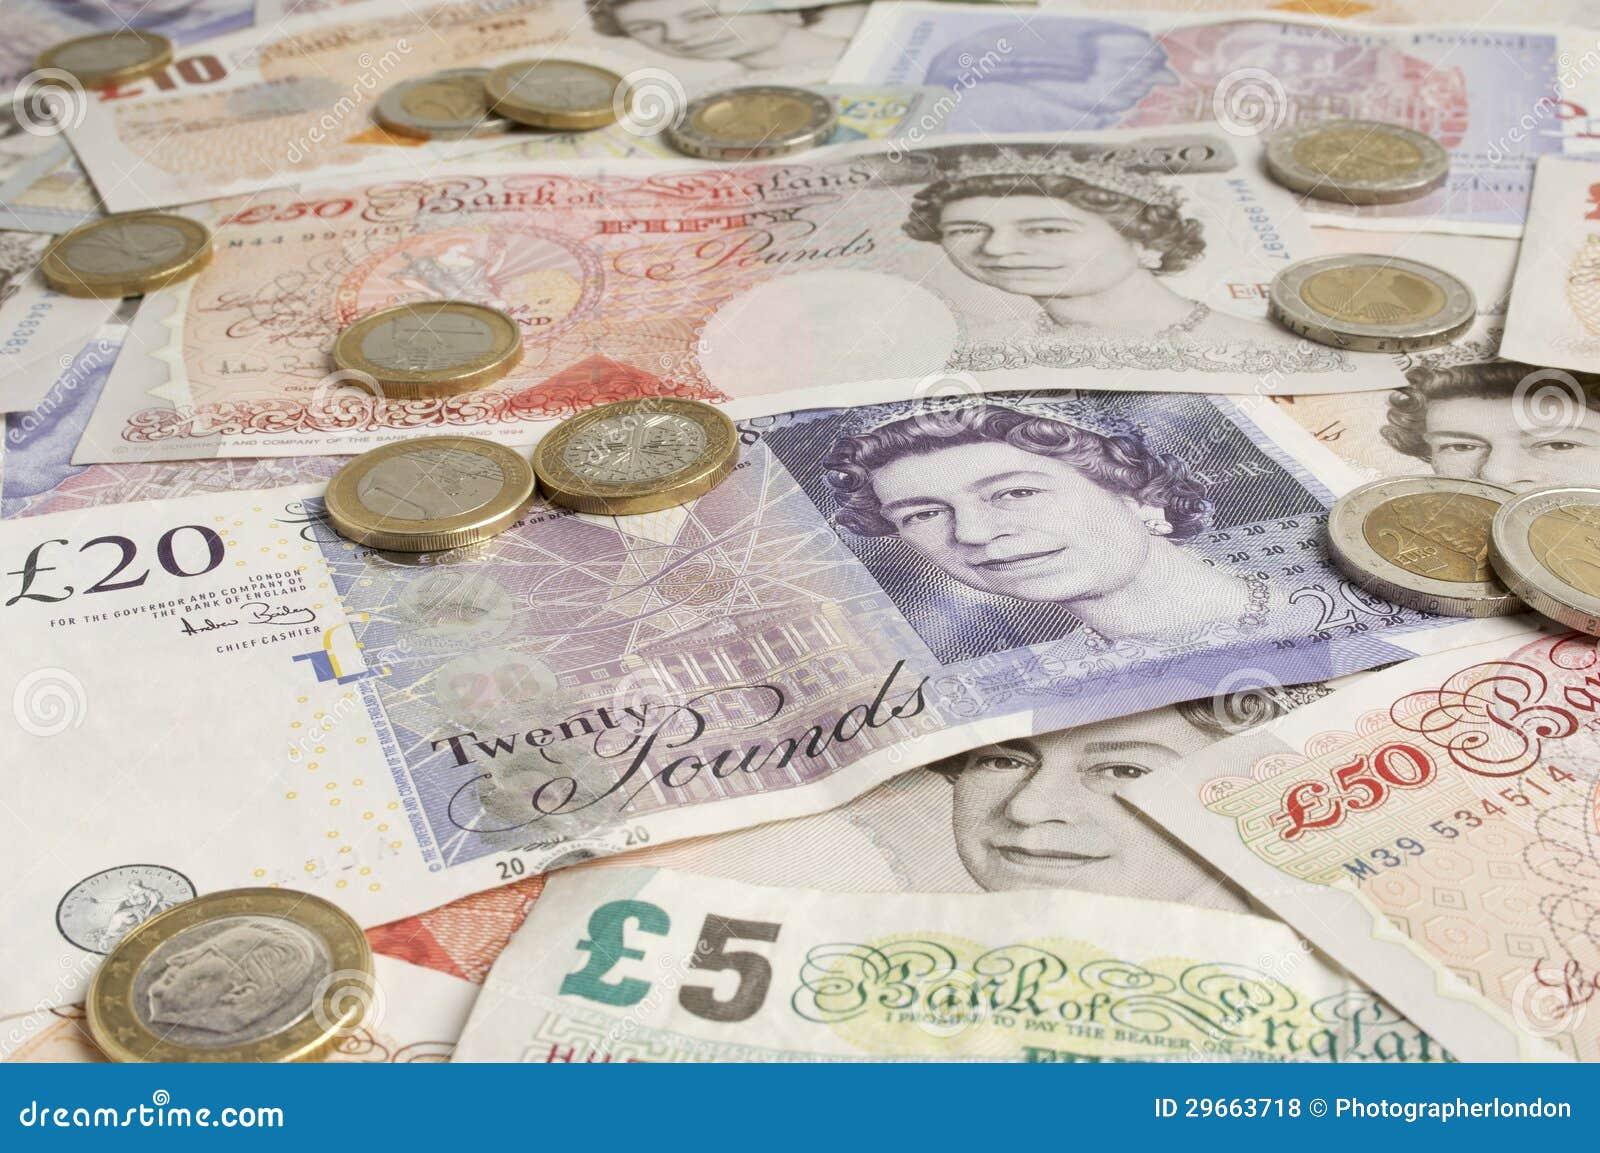 British monetary system essay